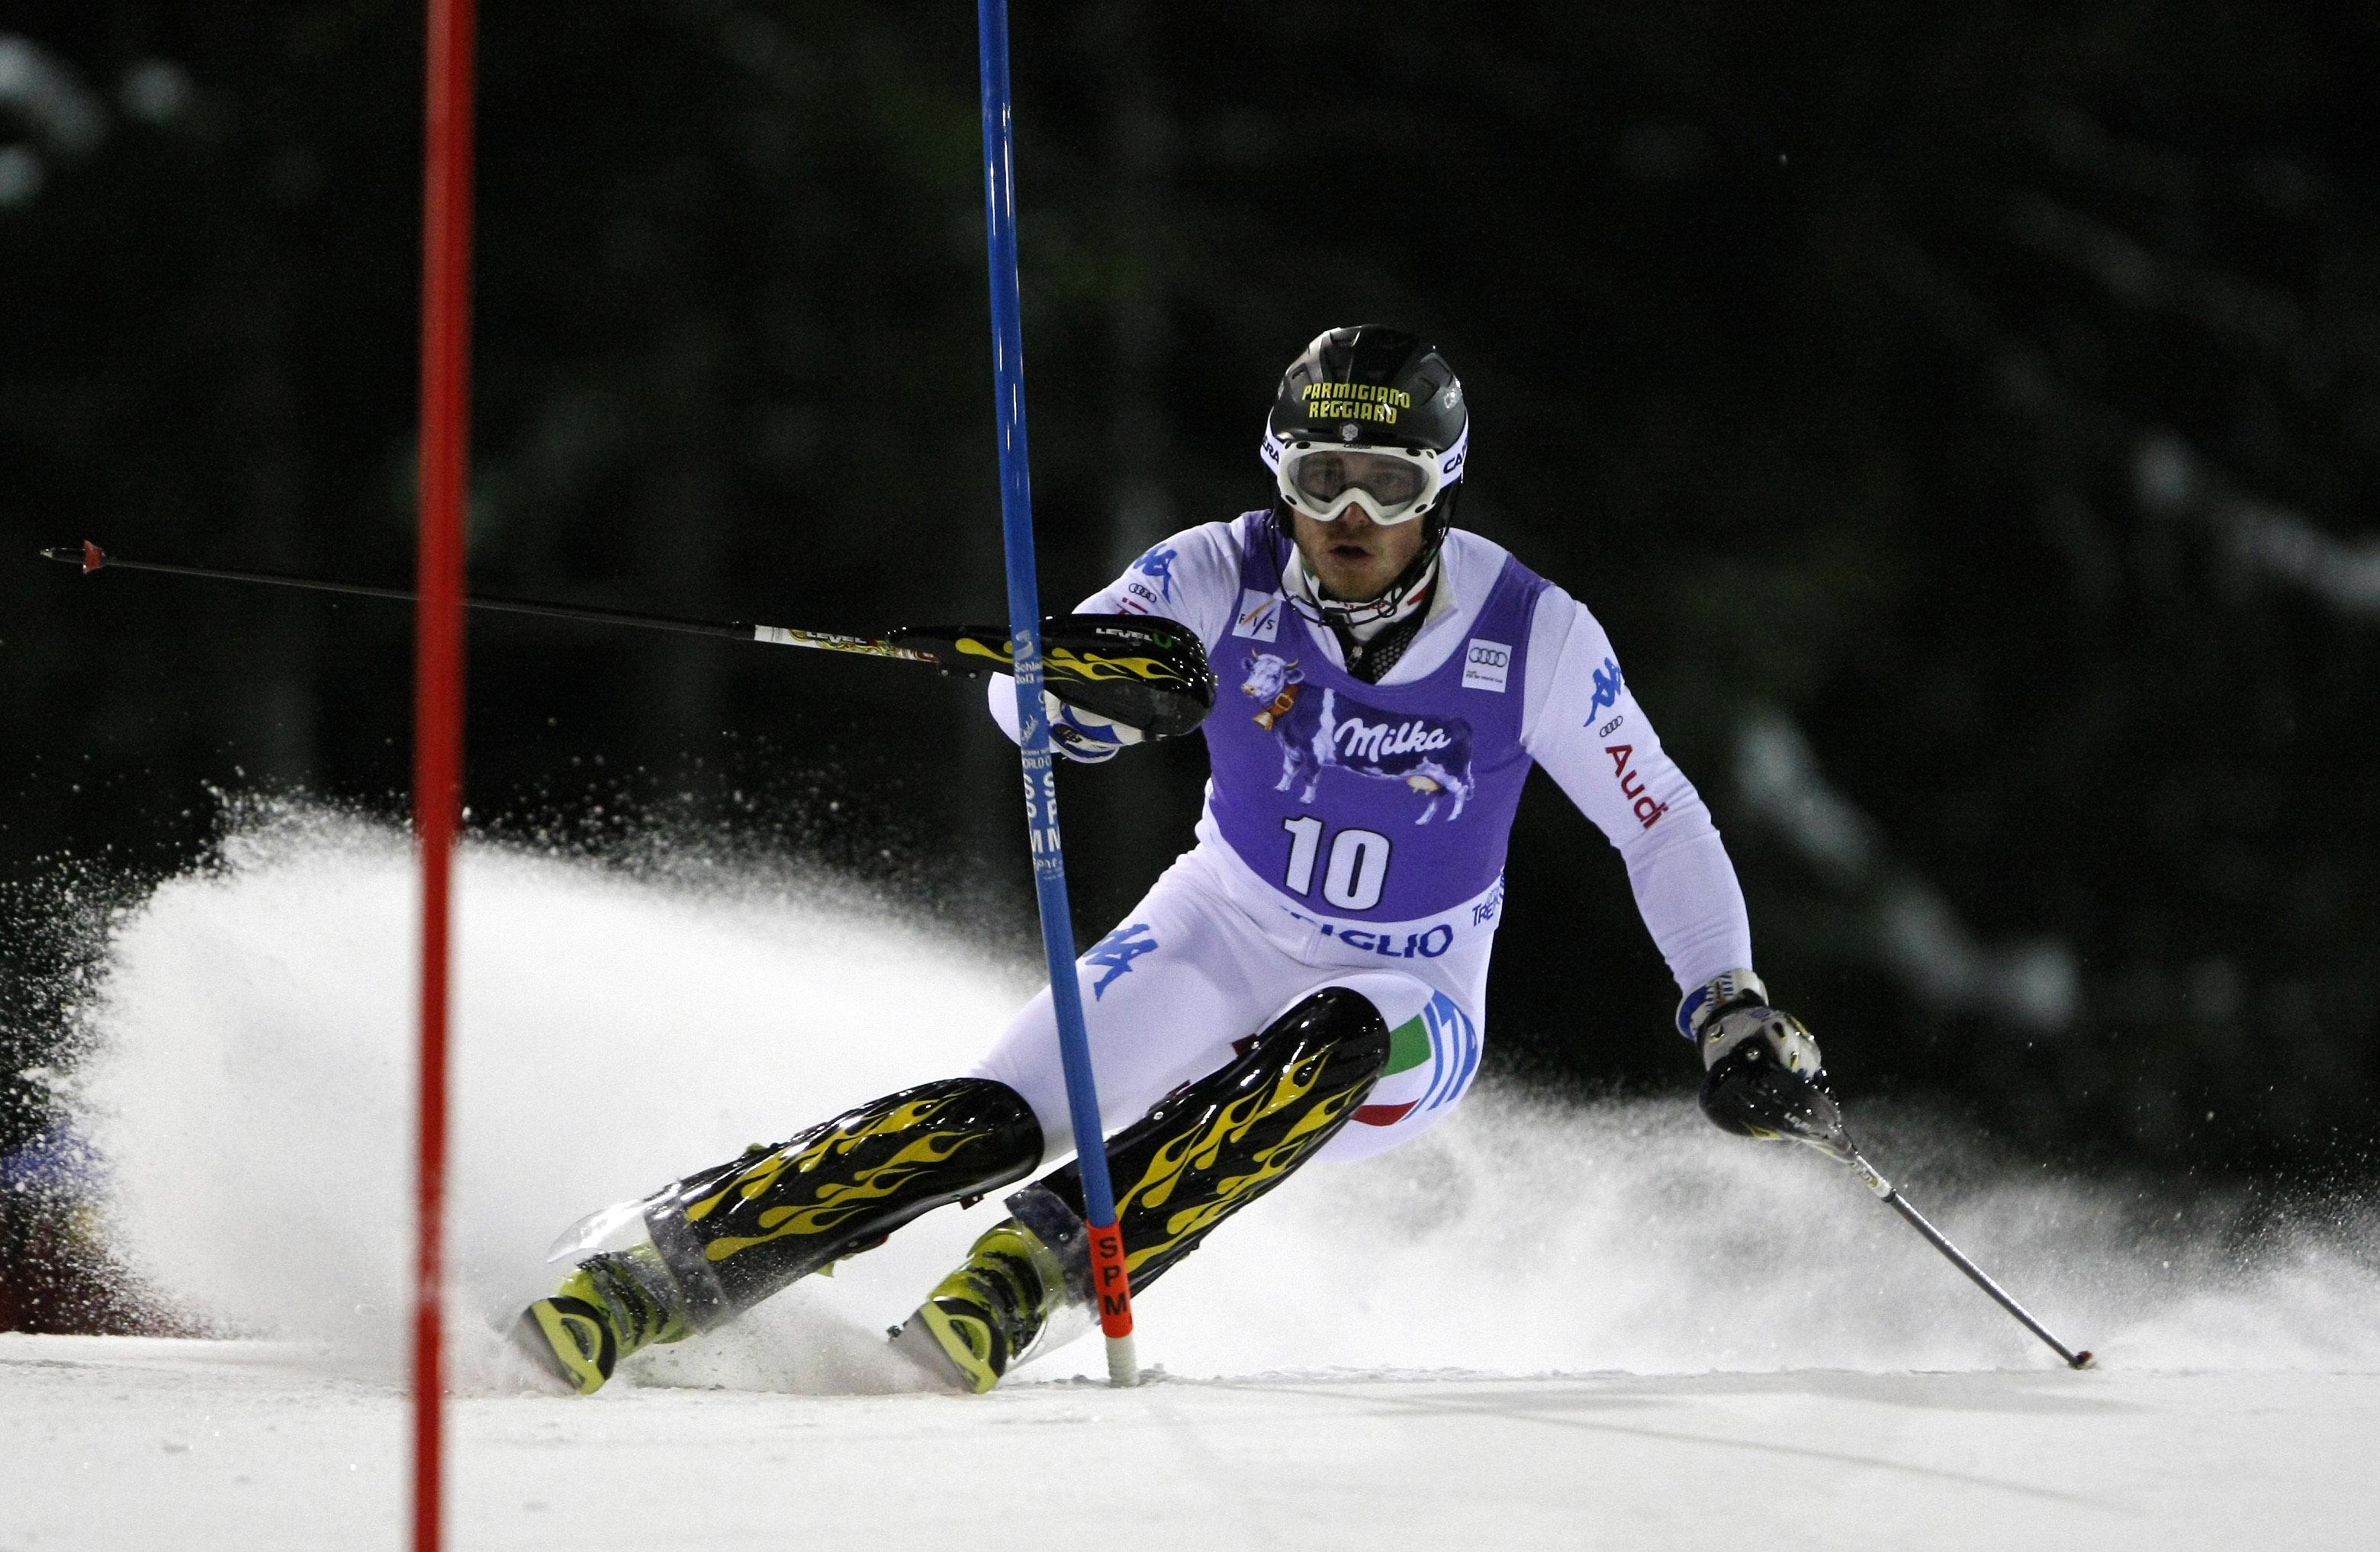 100 best ski runs in the world | CNN Travel